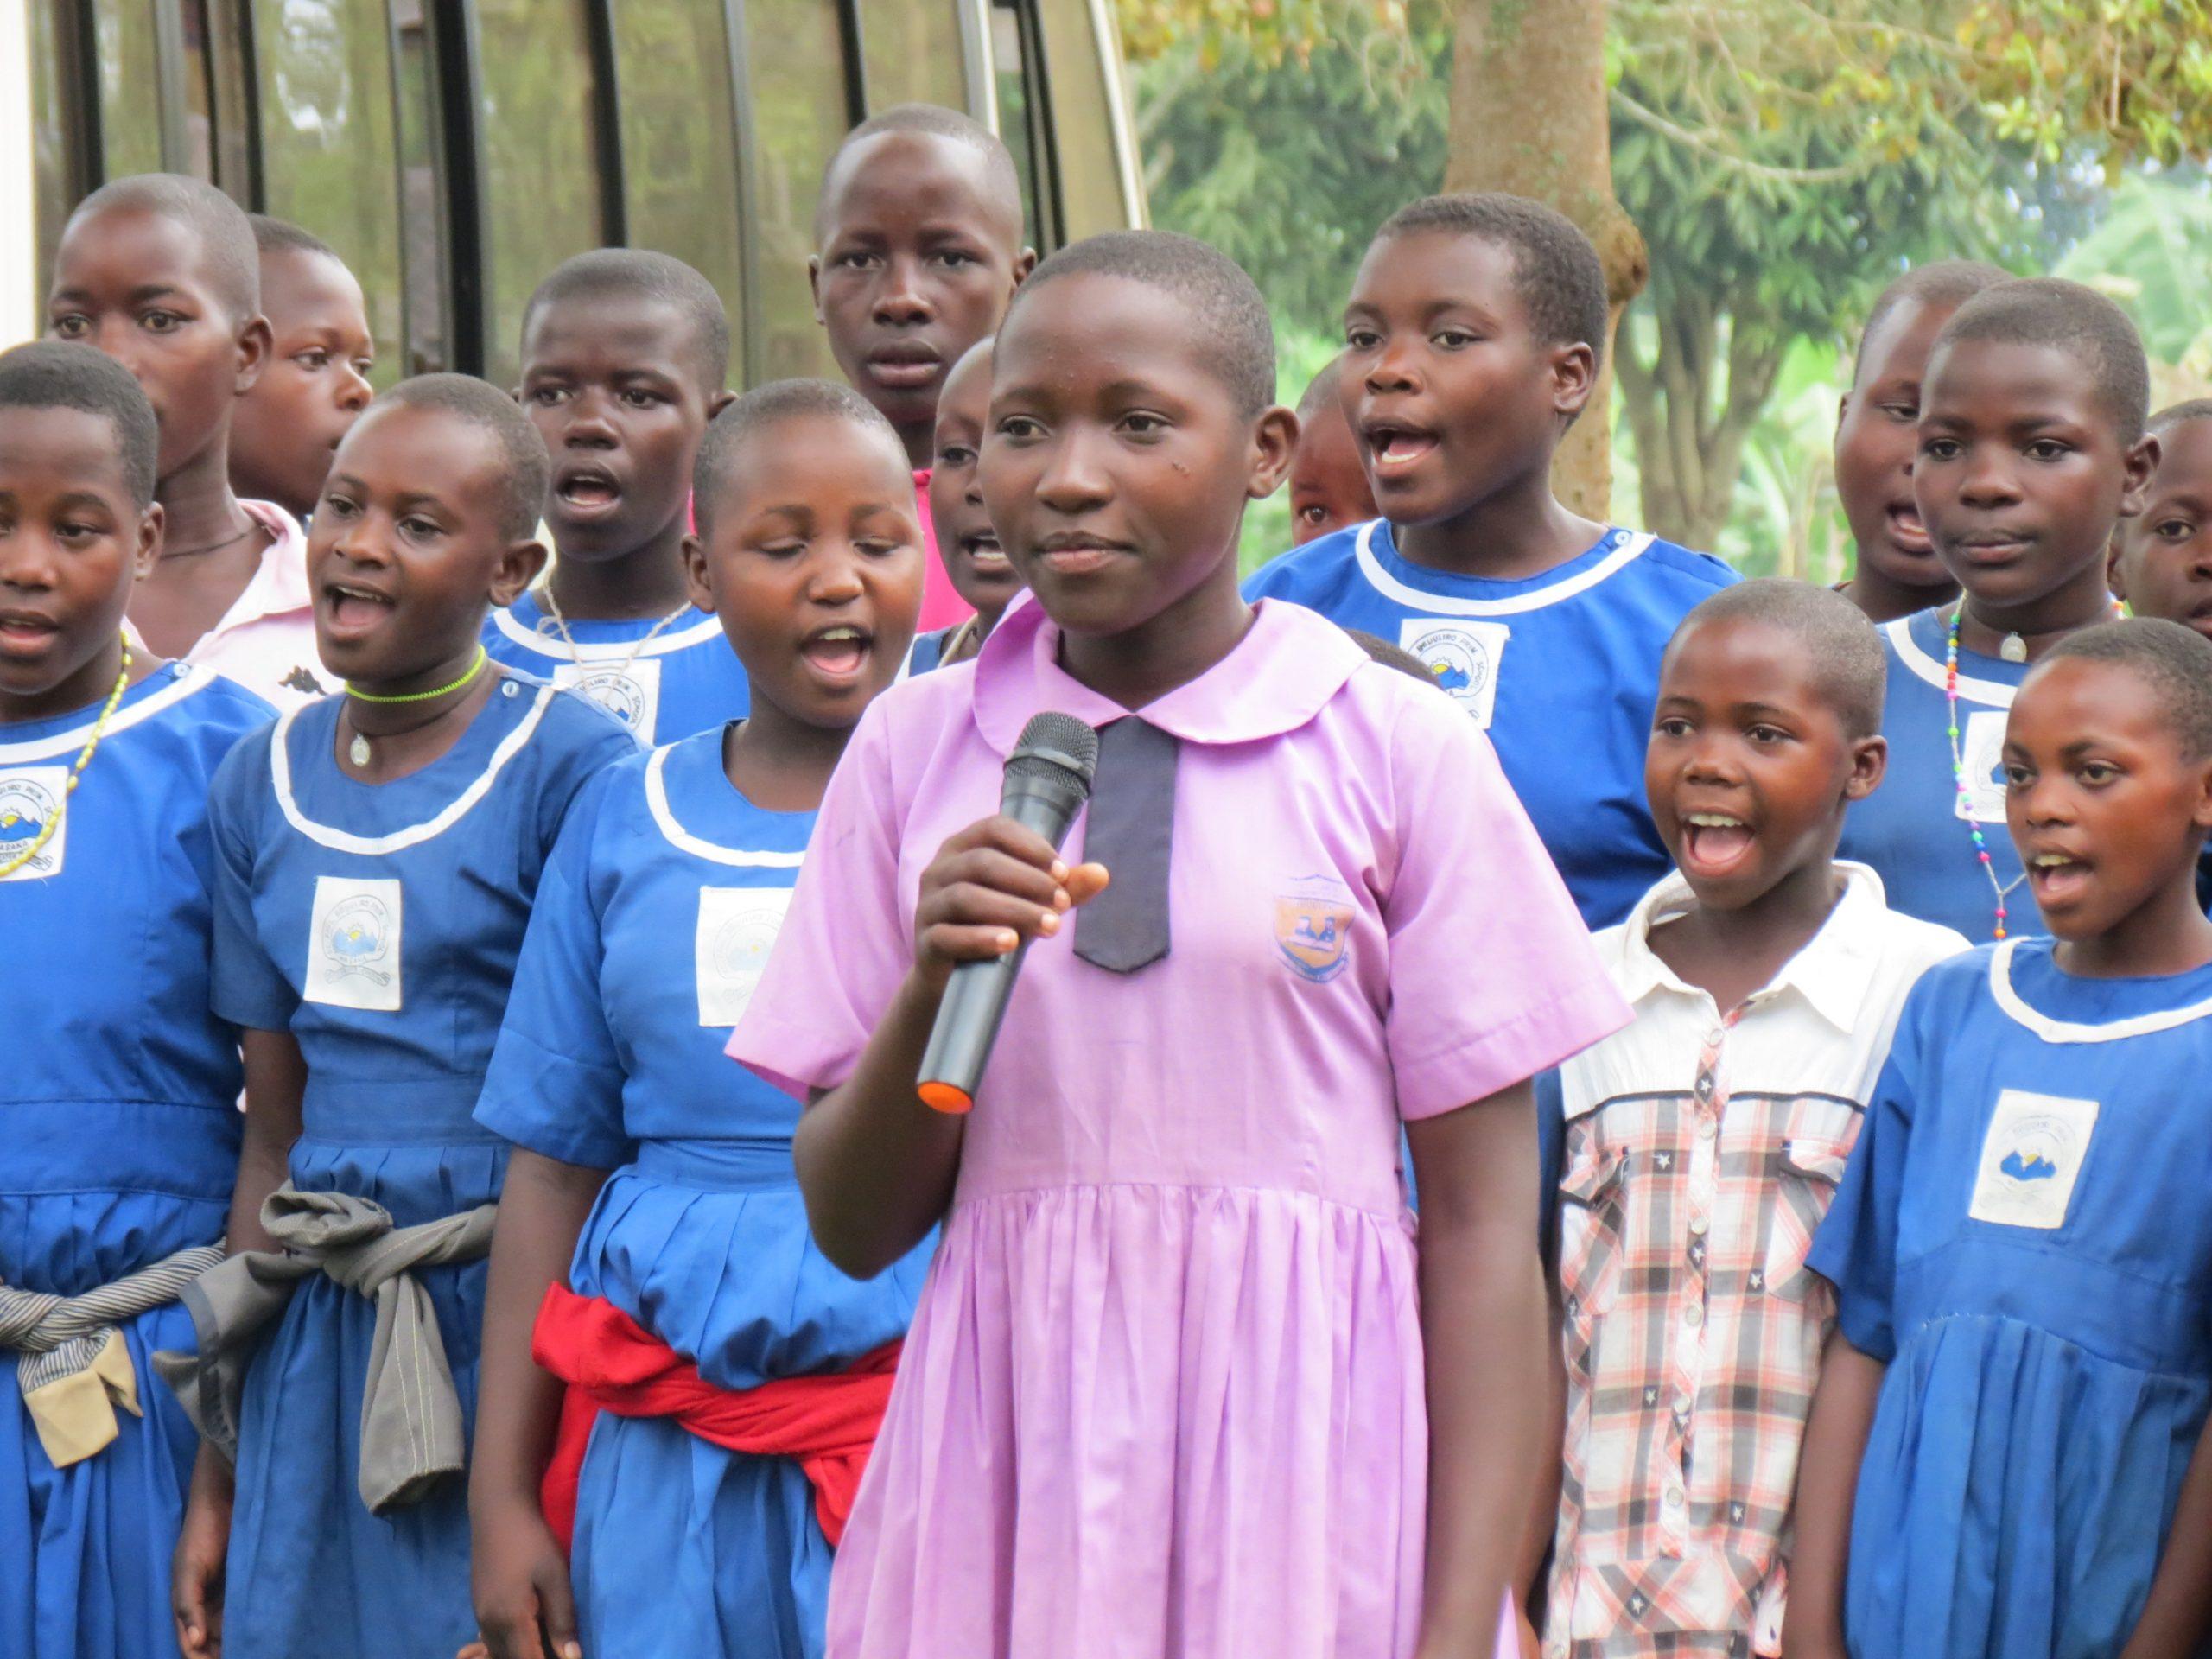 Empowering Women & Girls